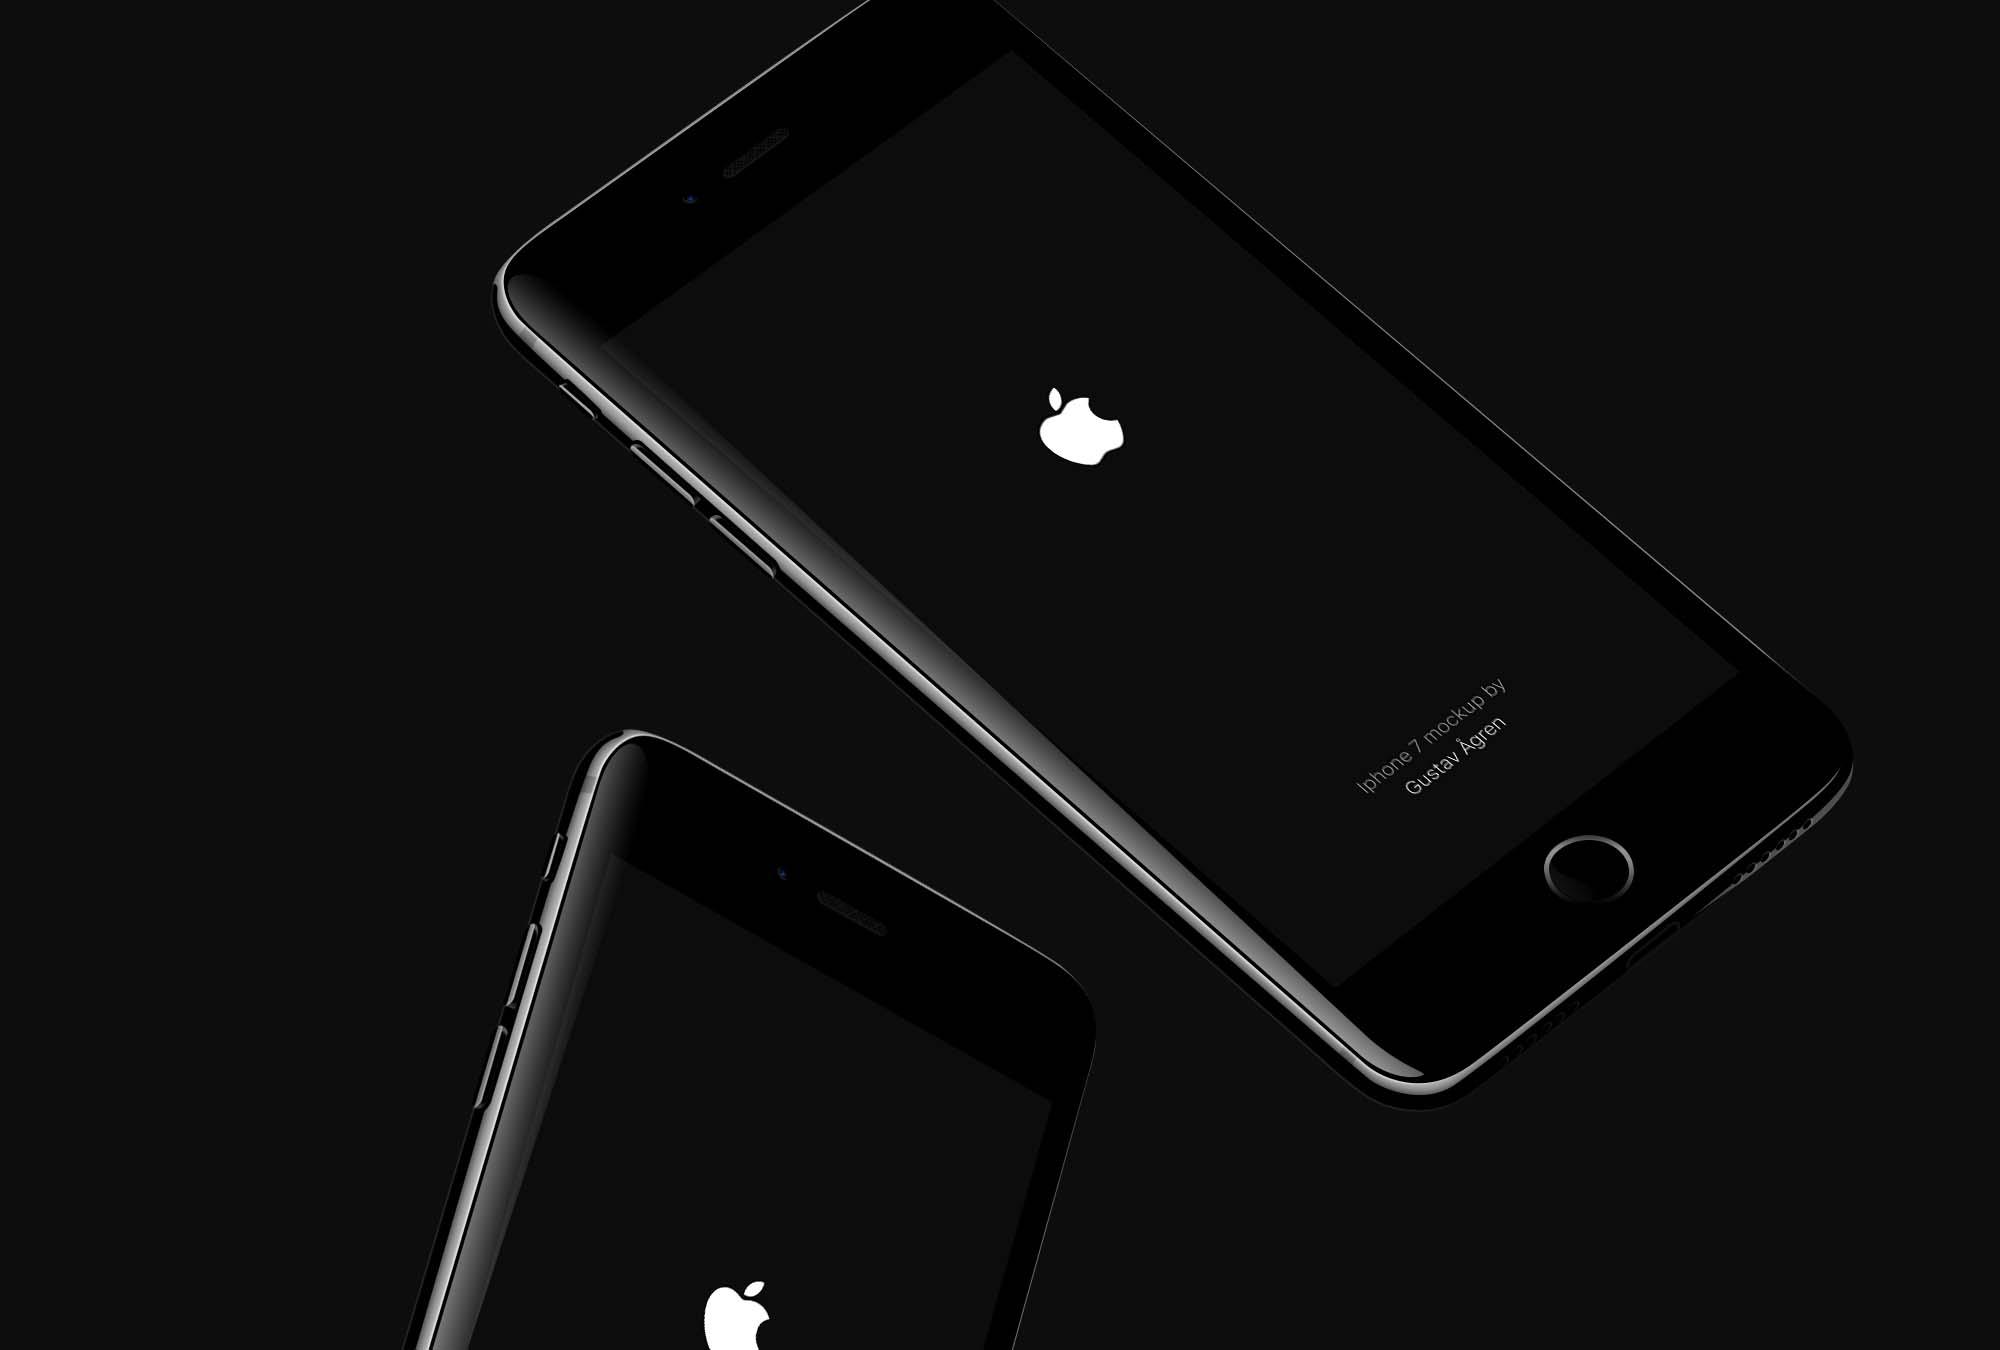 JetBlack Phone Mockup